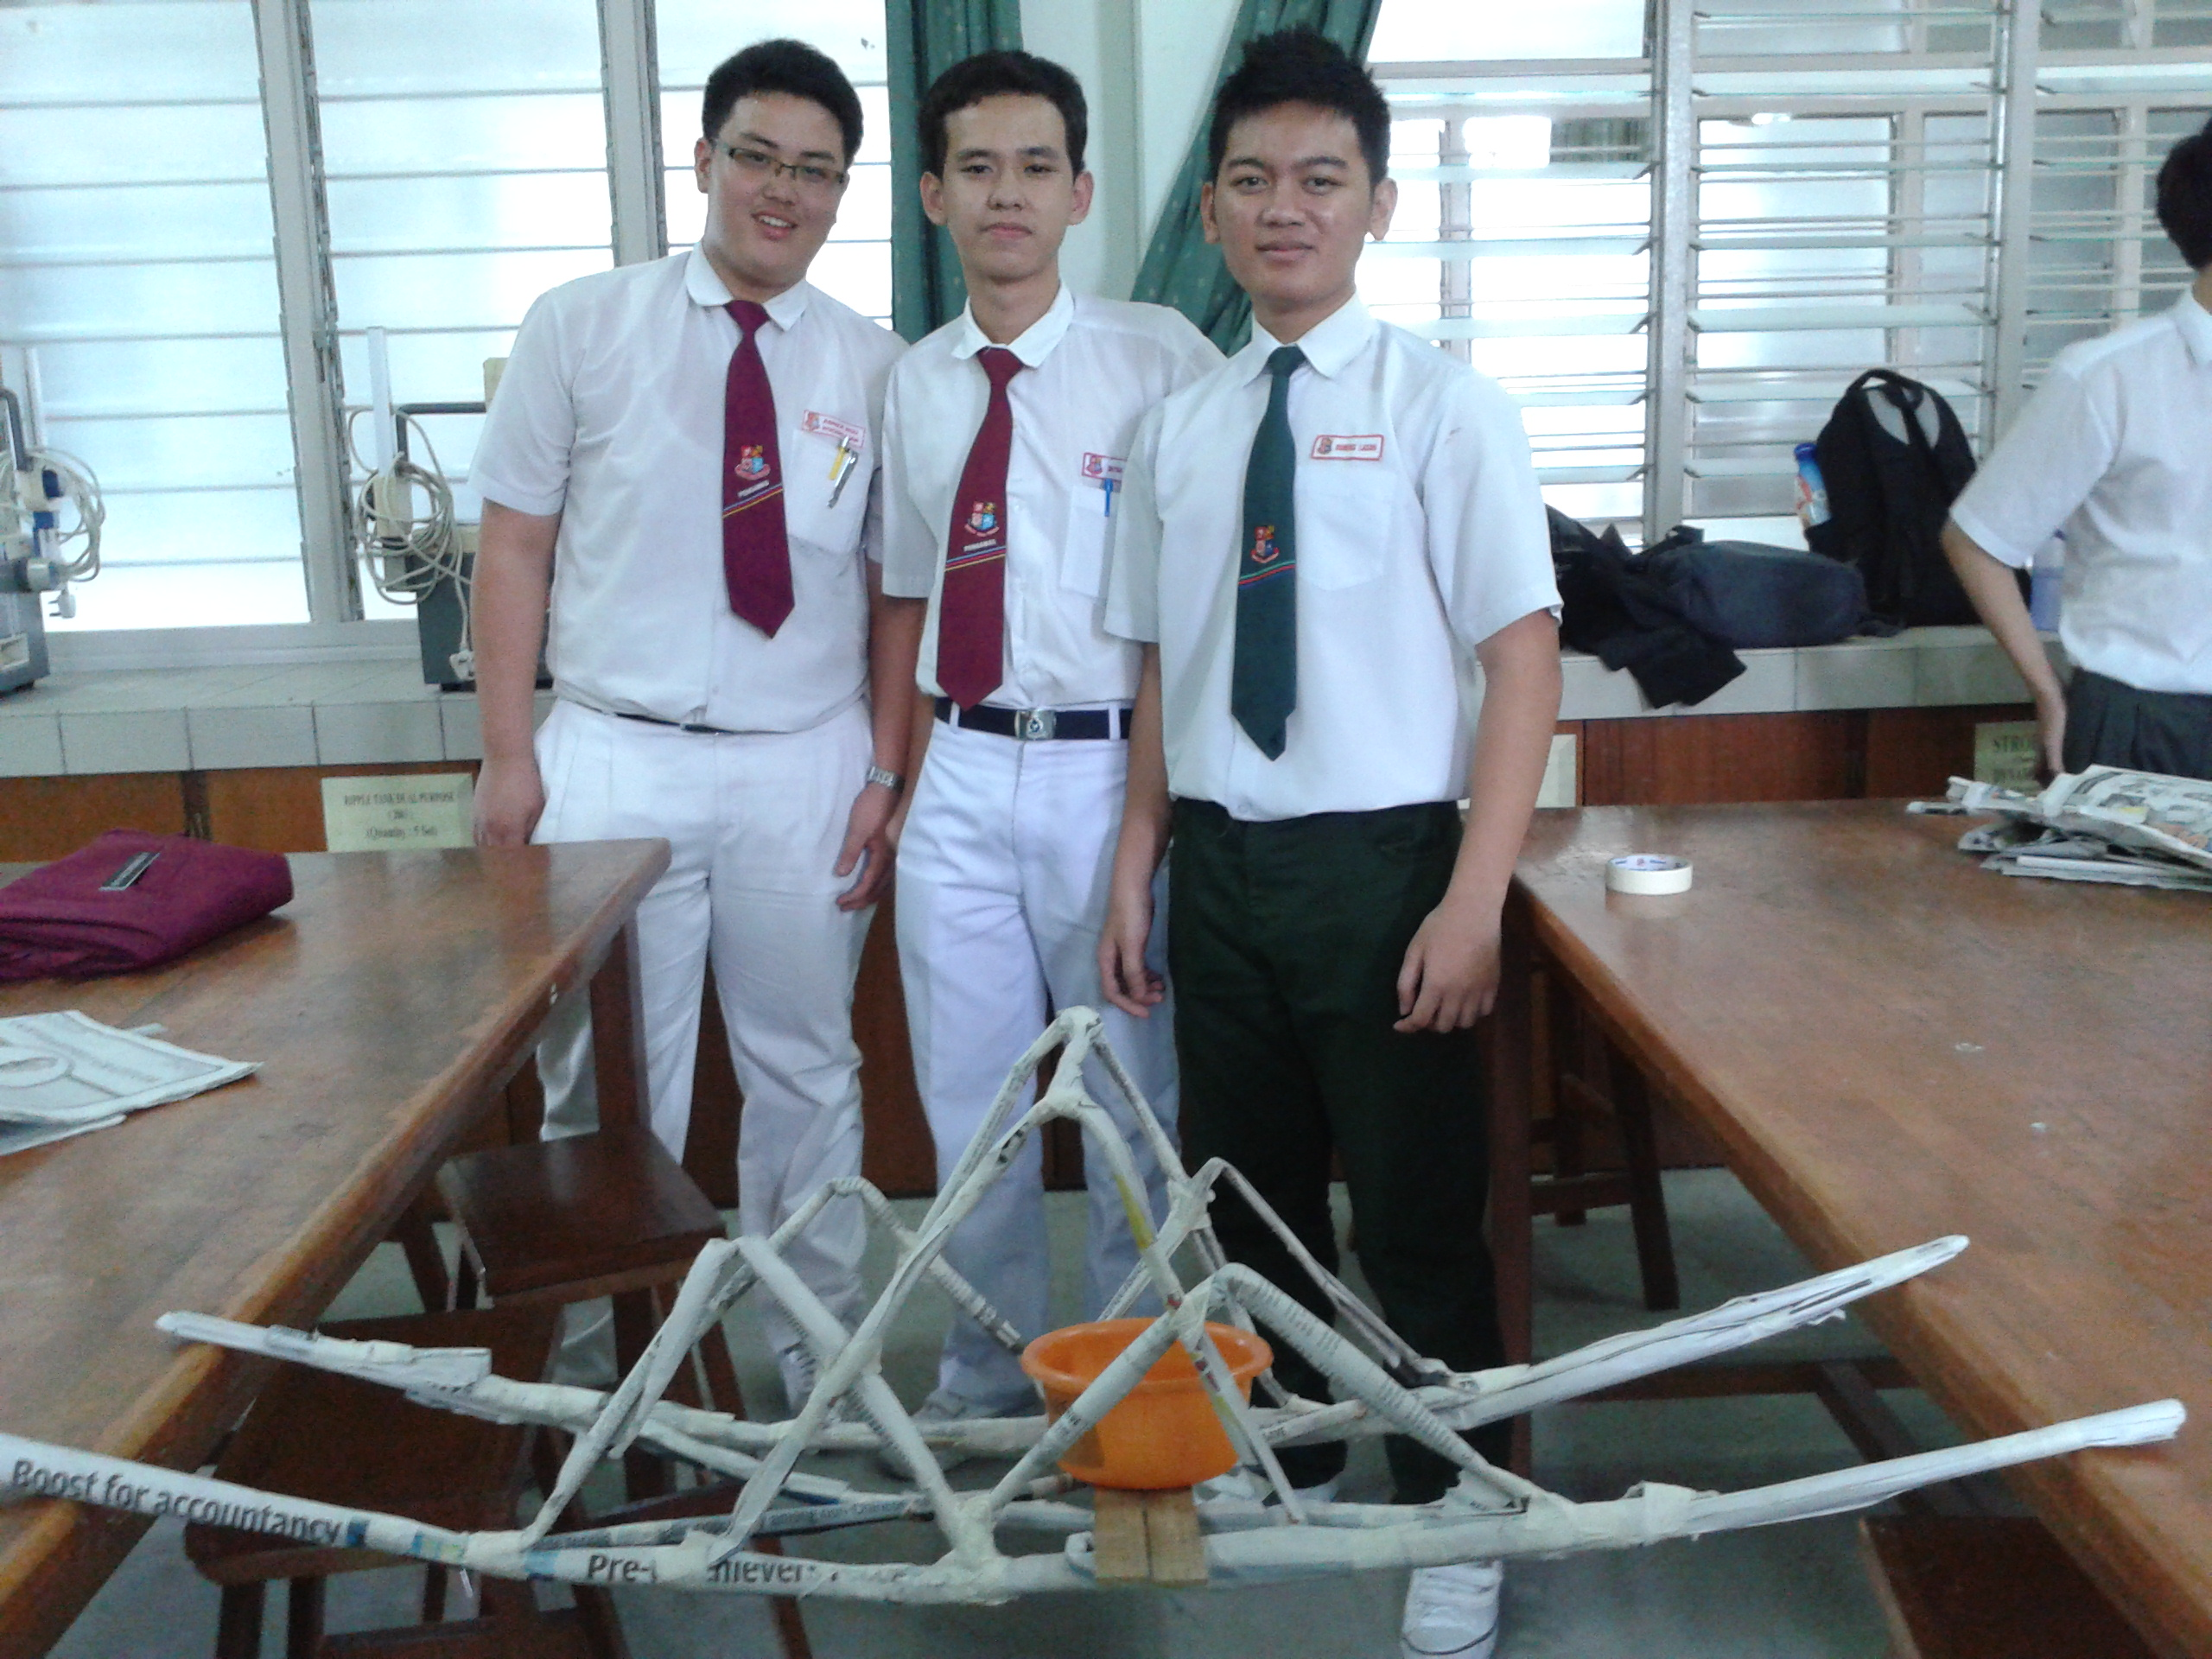 Paper Bridge Challenge  shsphysicsclub